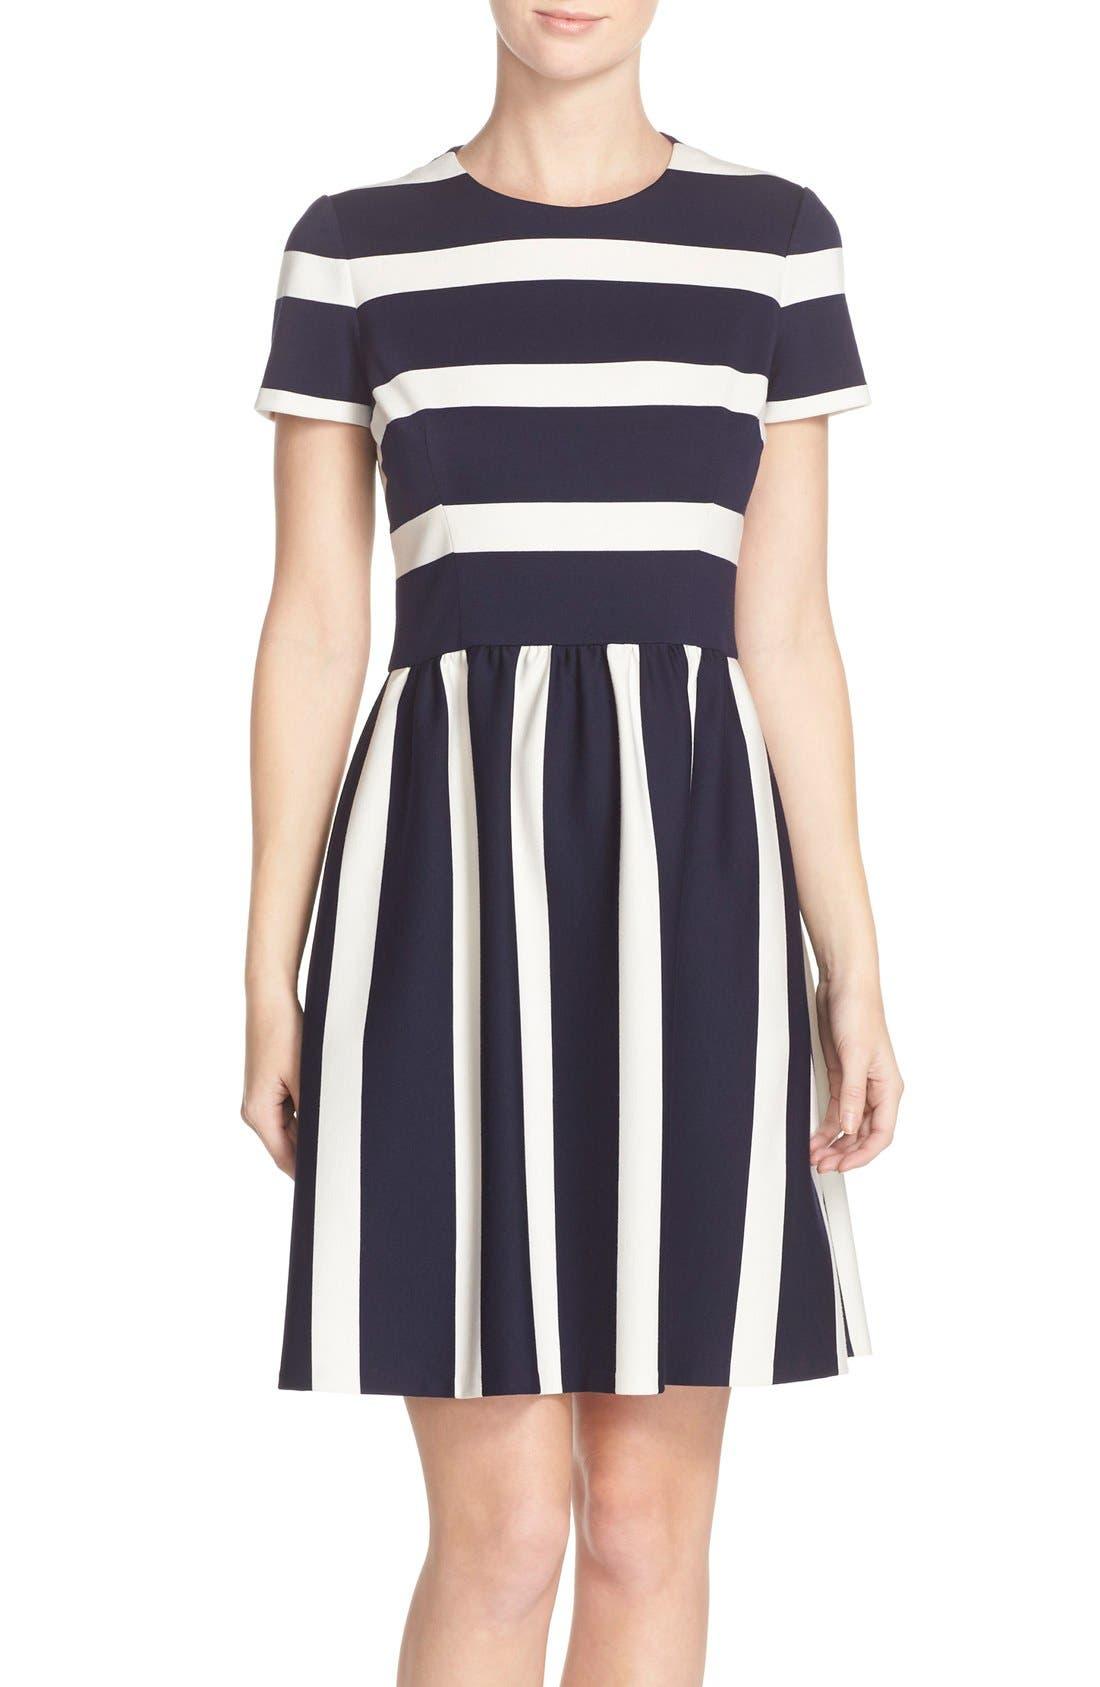 Alternate Image 1 Selected - Eliza J Stripe Knit Fit & Flare Dress (Regular & Petite)